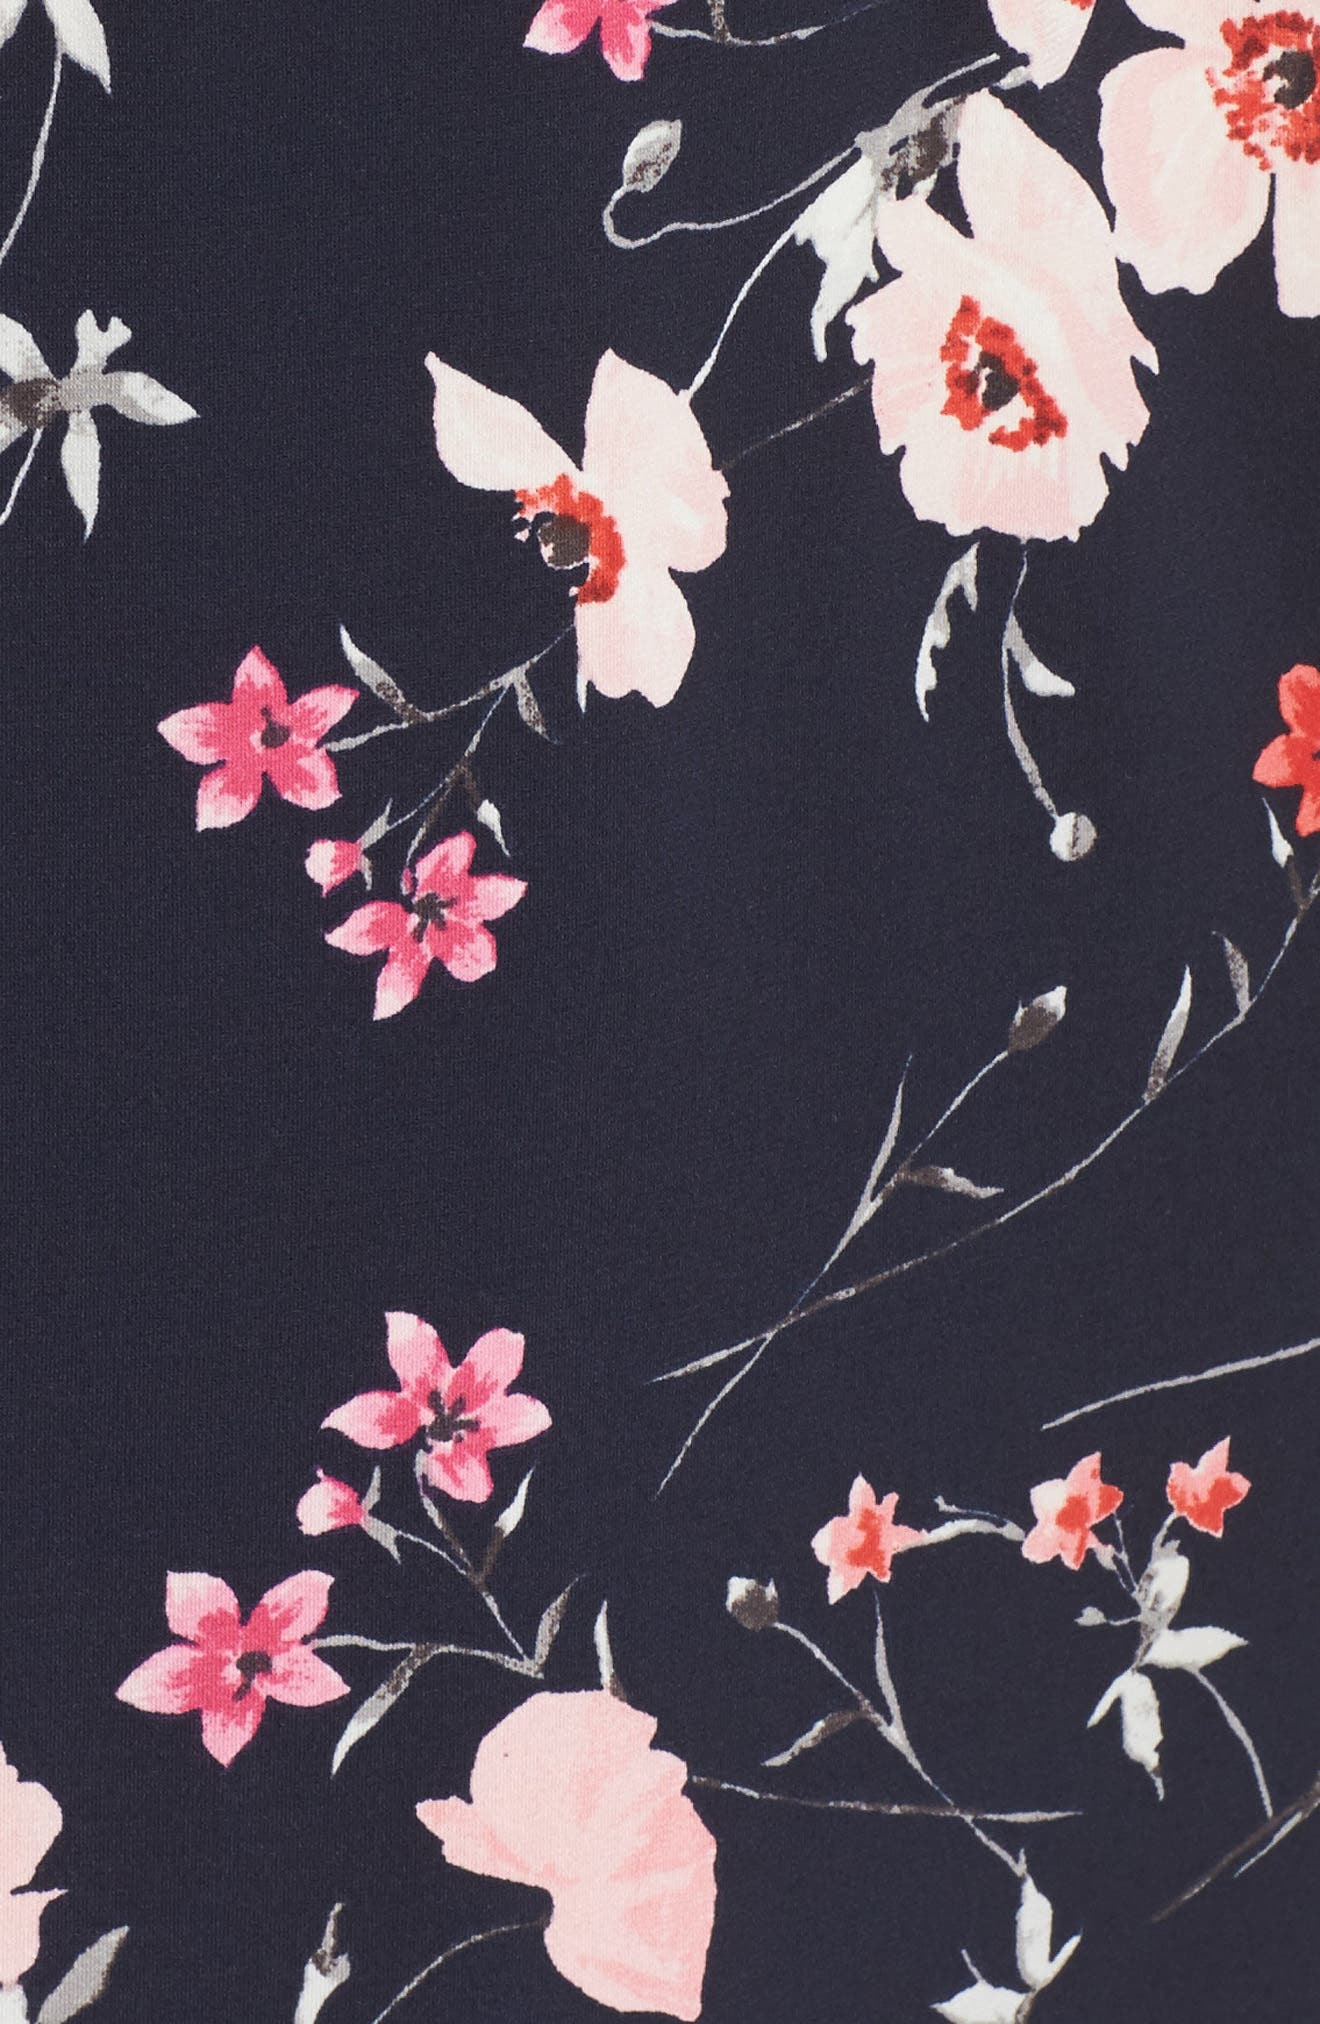 Floral Print Surplice Dress,                             Alternate thumbnail 6, color,                             Navy/ Pink